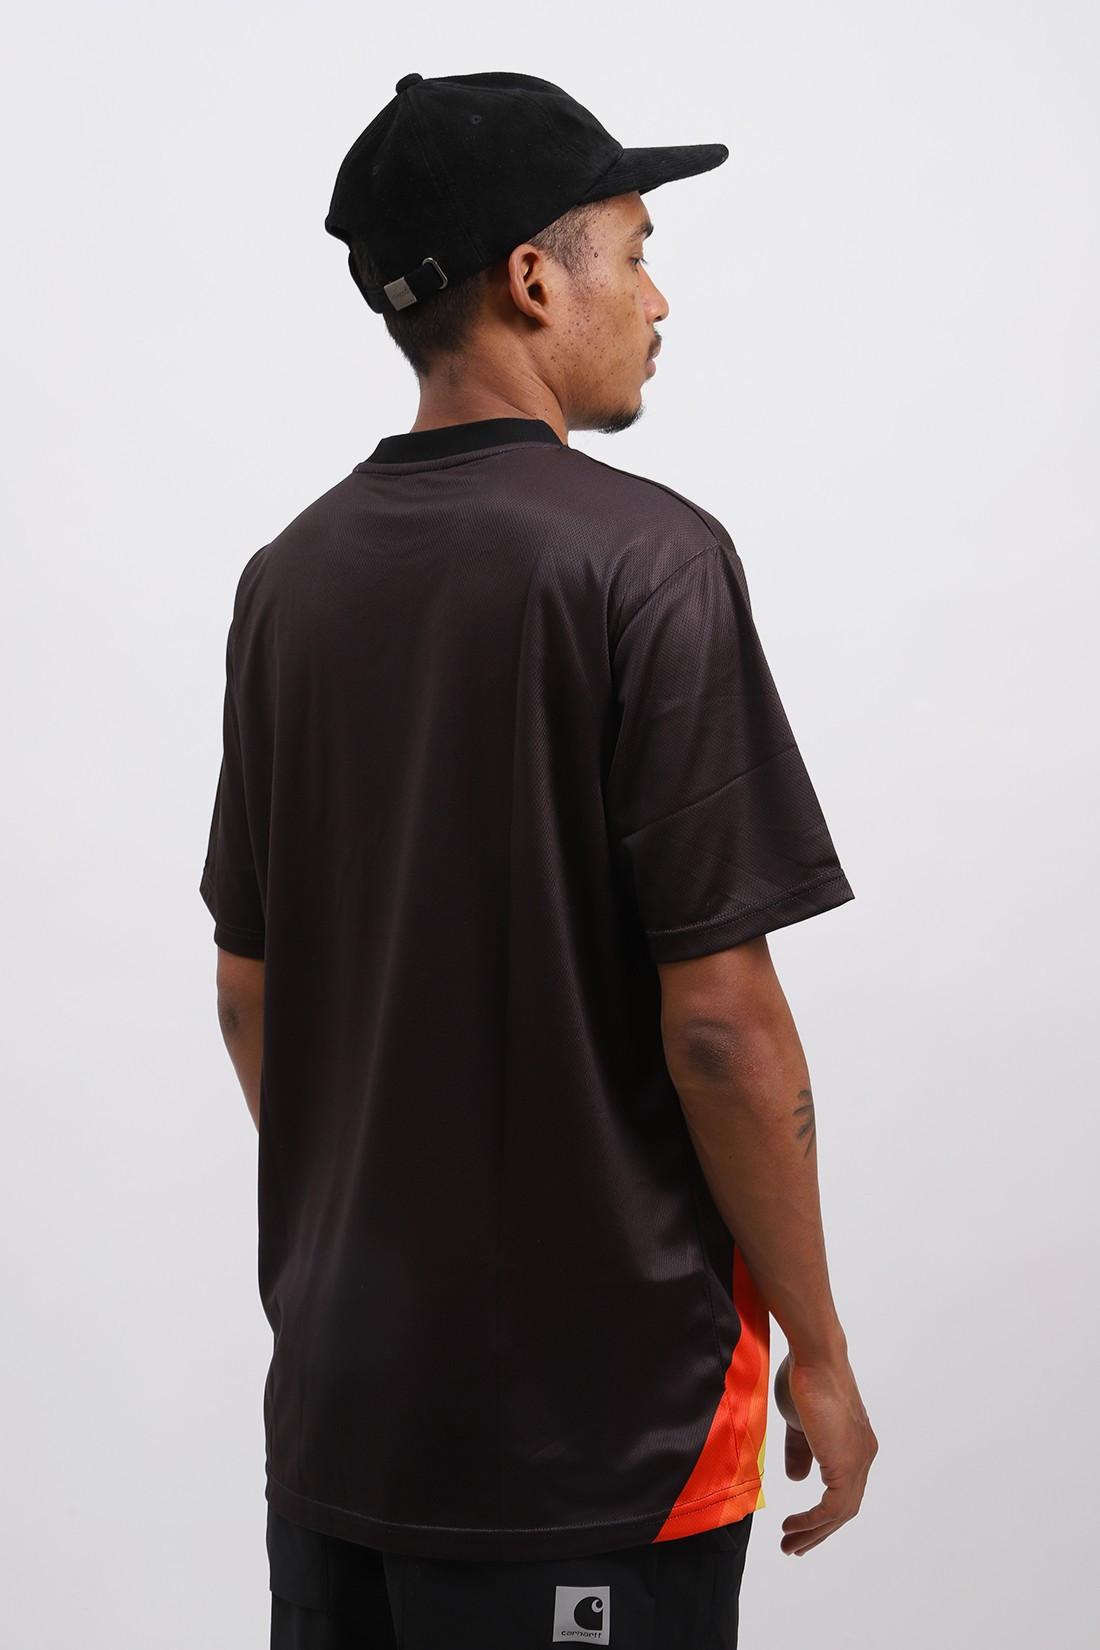 RAVE / Beyond jersey Black